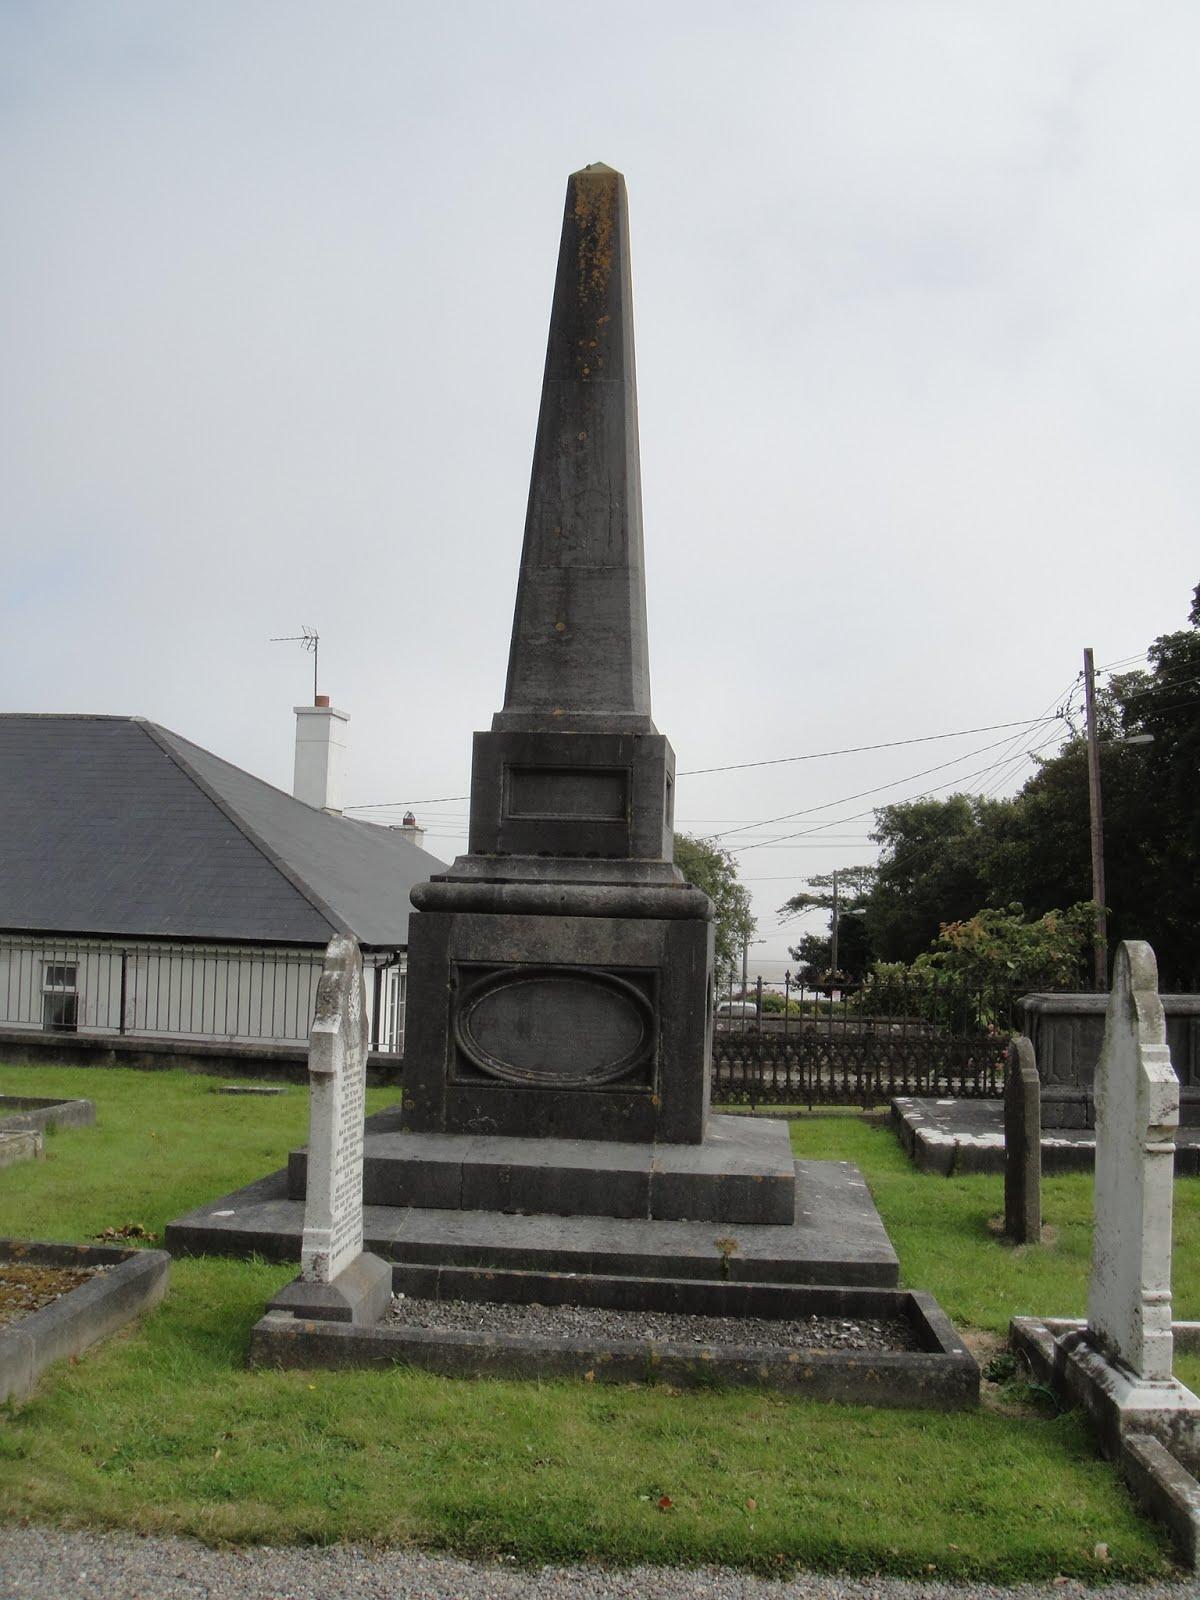 The Sea Horse Cenotaph